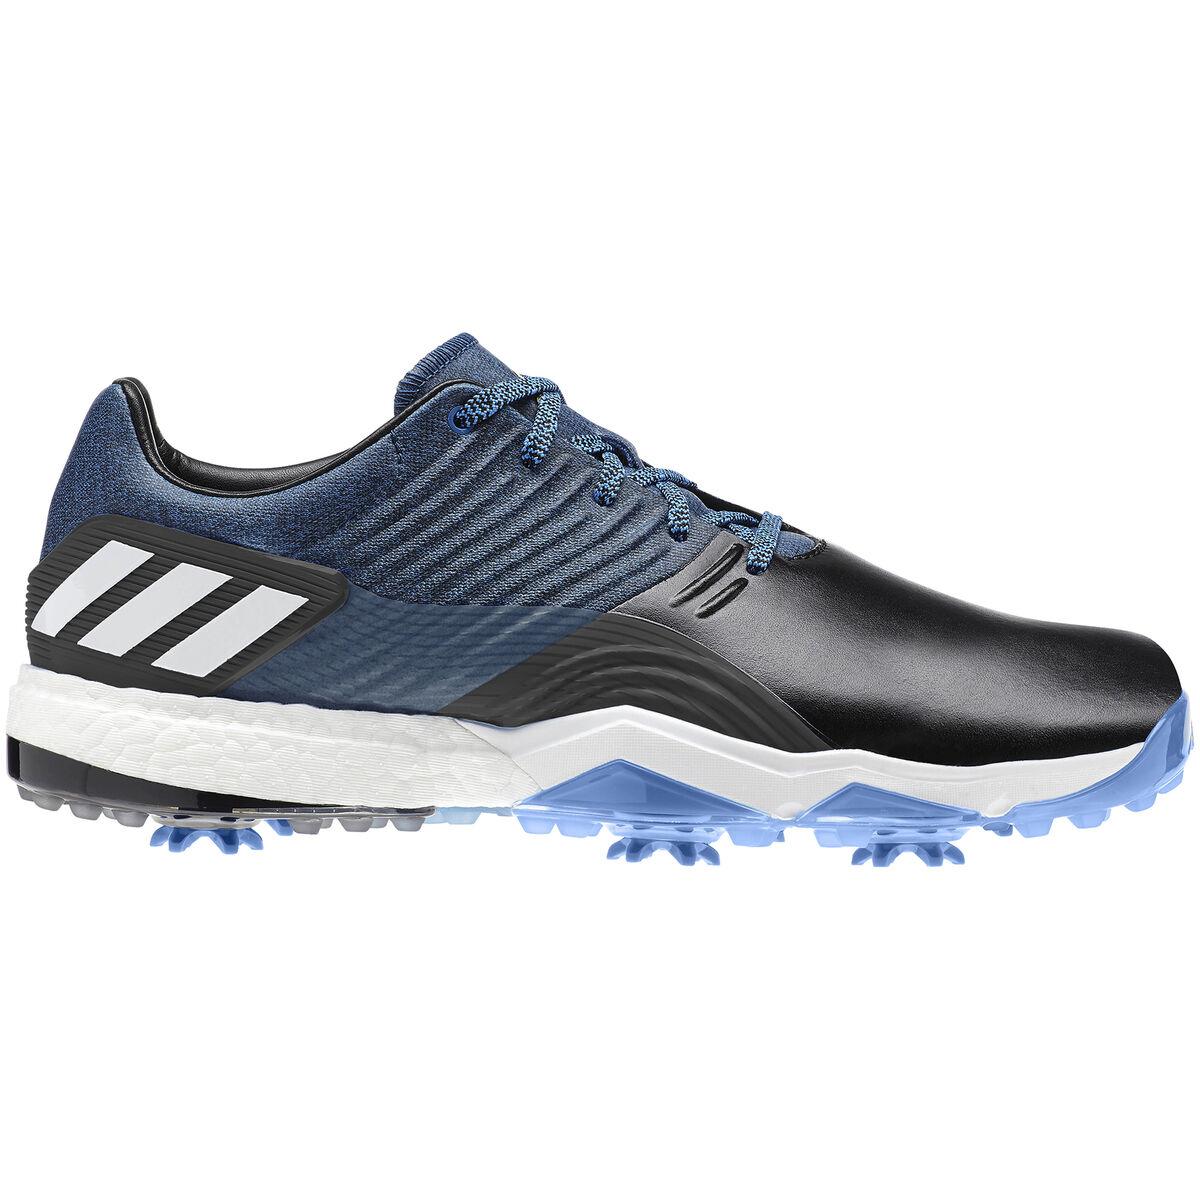 1f7ea932bad Images. adidas adipower 4ORGED Men  39 s Golf Shoe - Black Blue